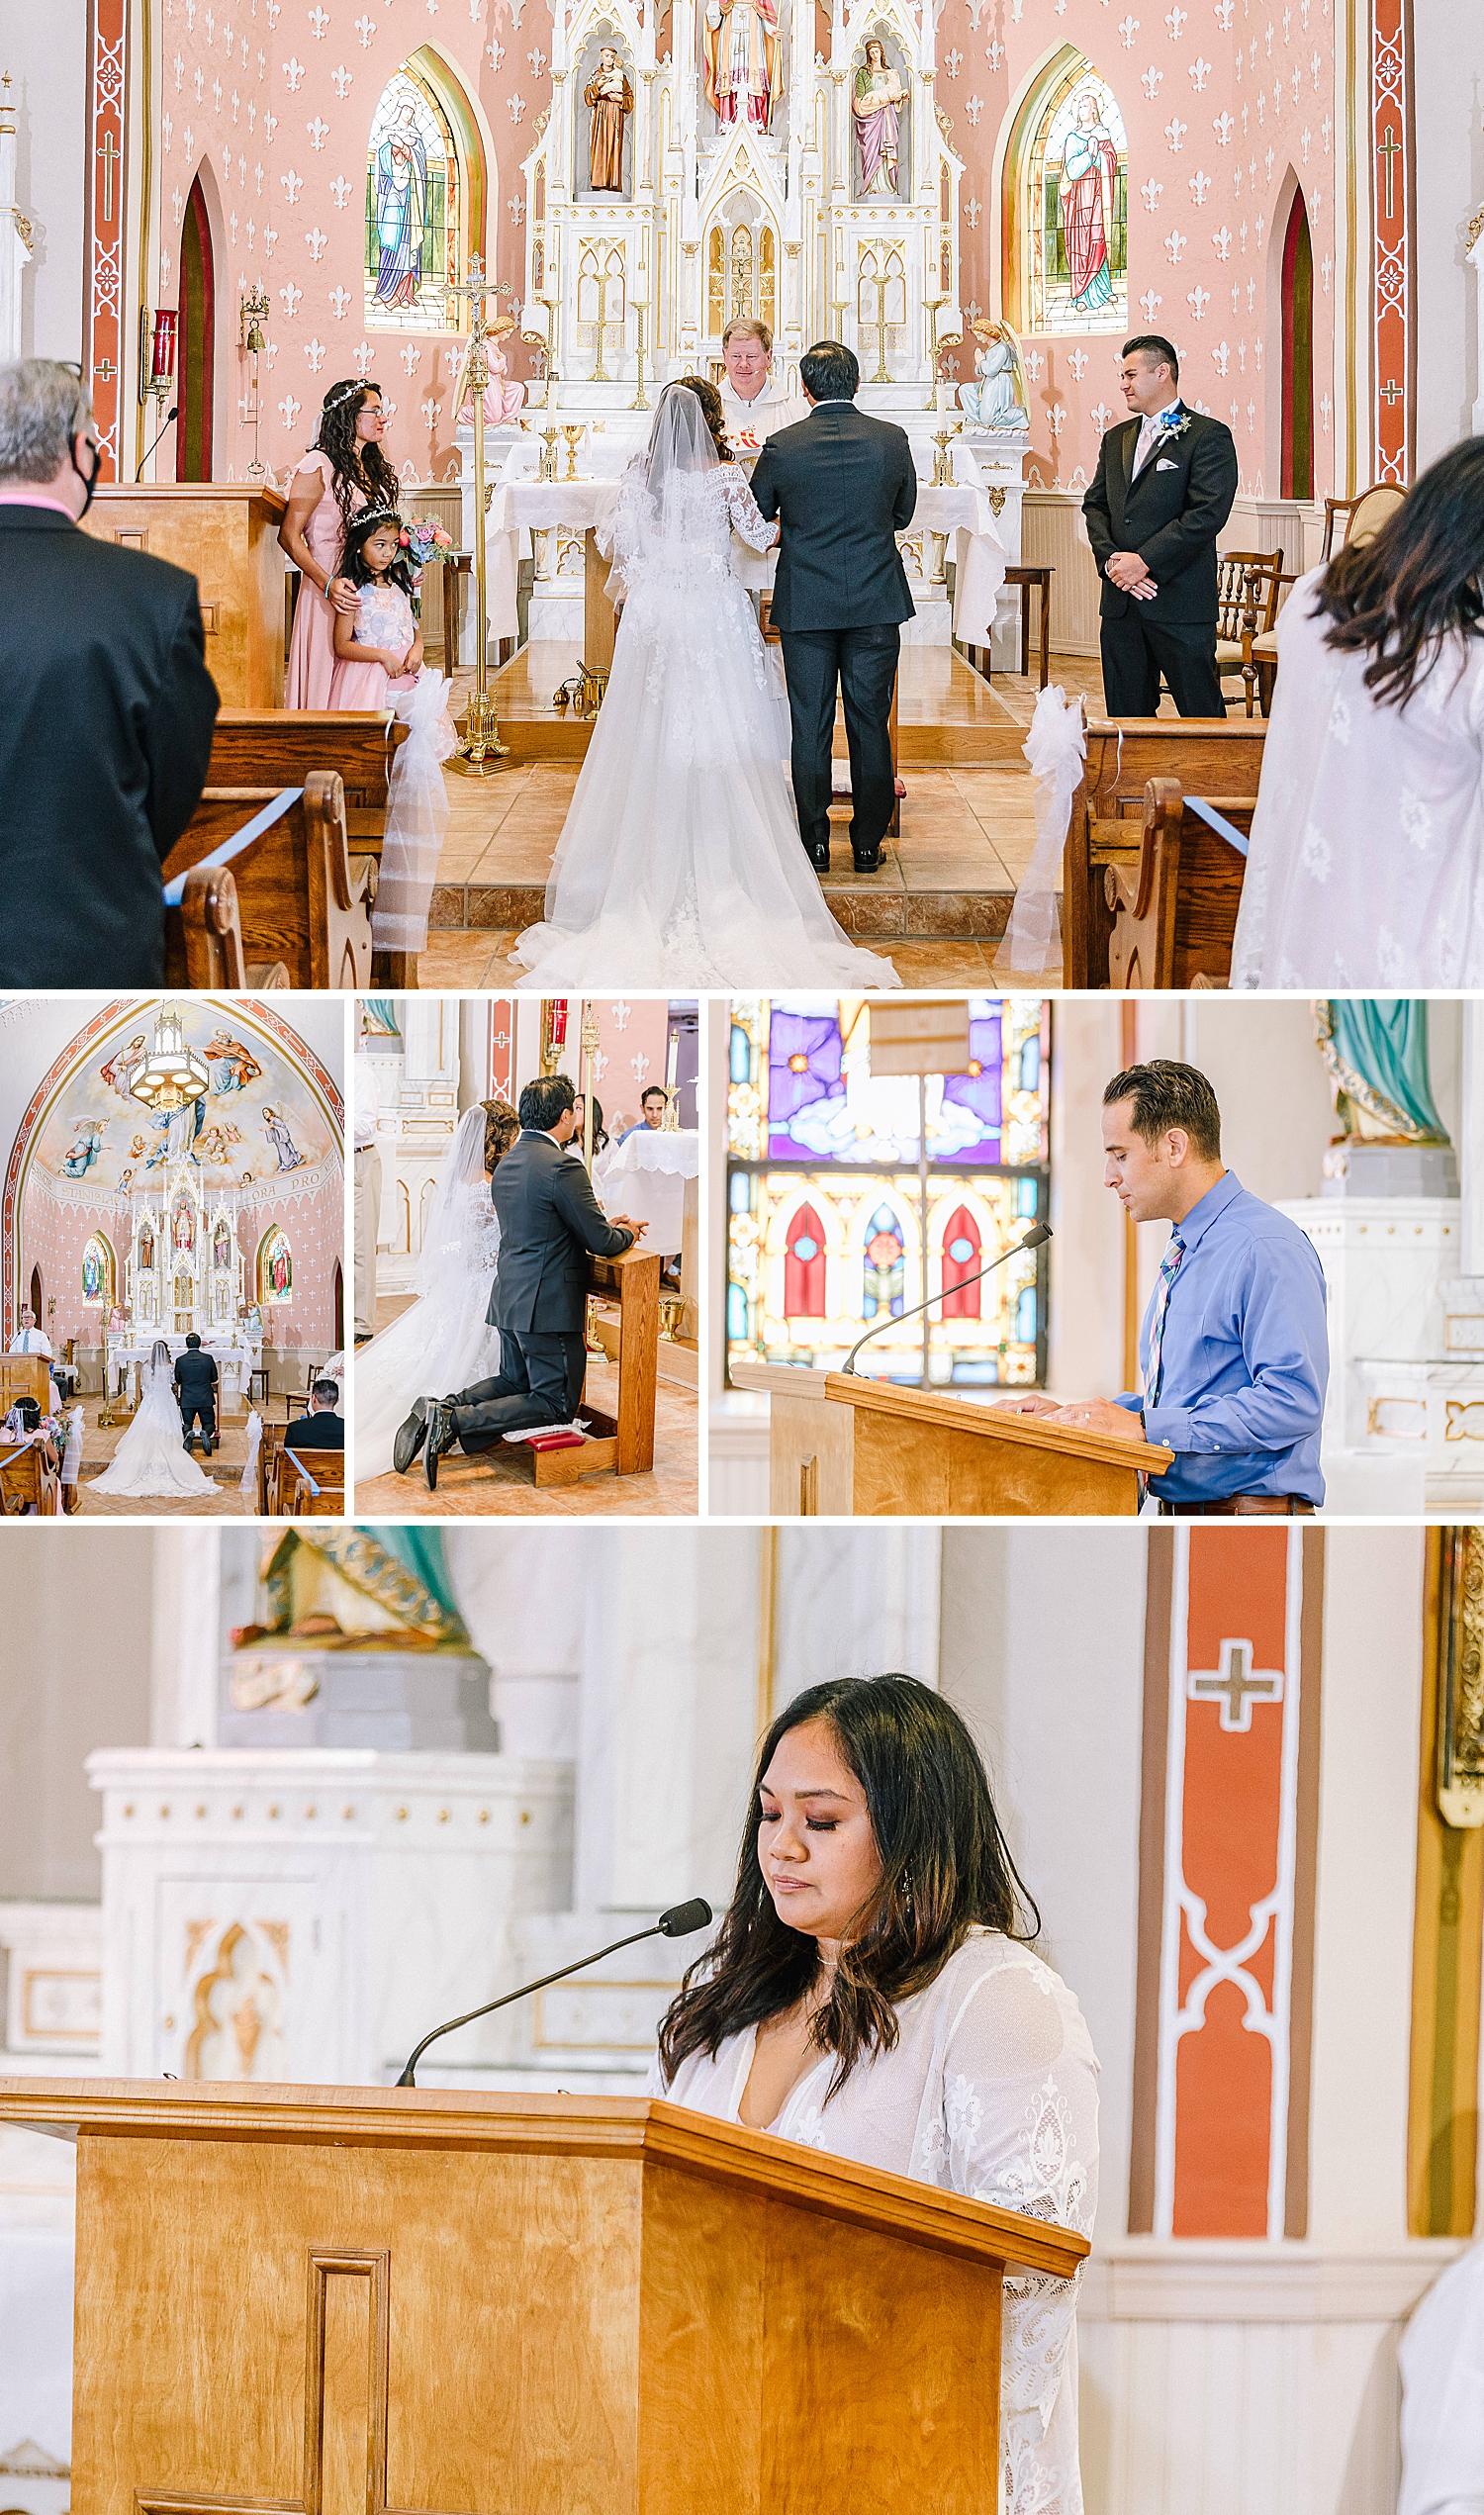 Bandera-Texas-Wedding-Photographer-Bride-Groom-on-Horses-Carly-Barton-Photography_0089.jpg